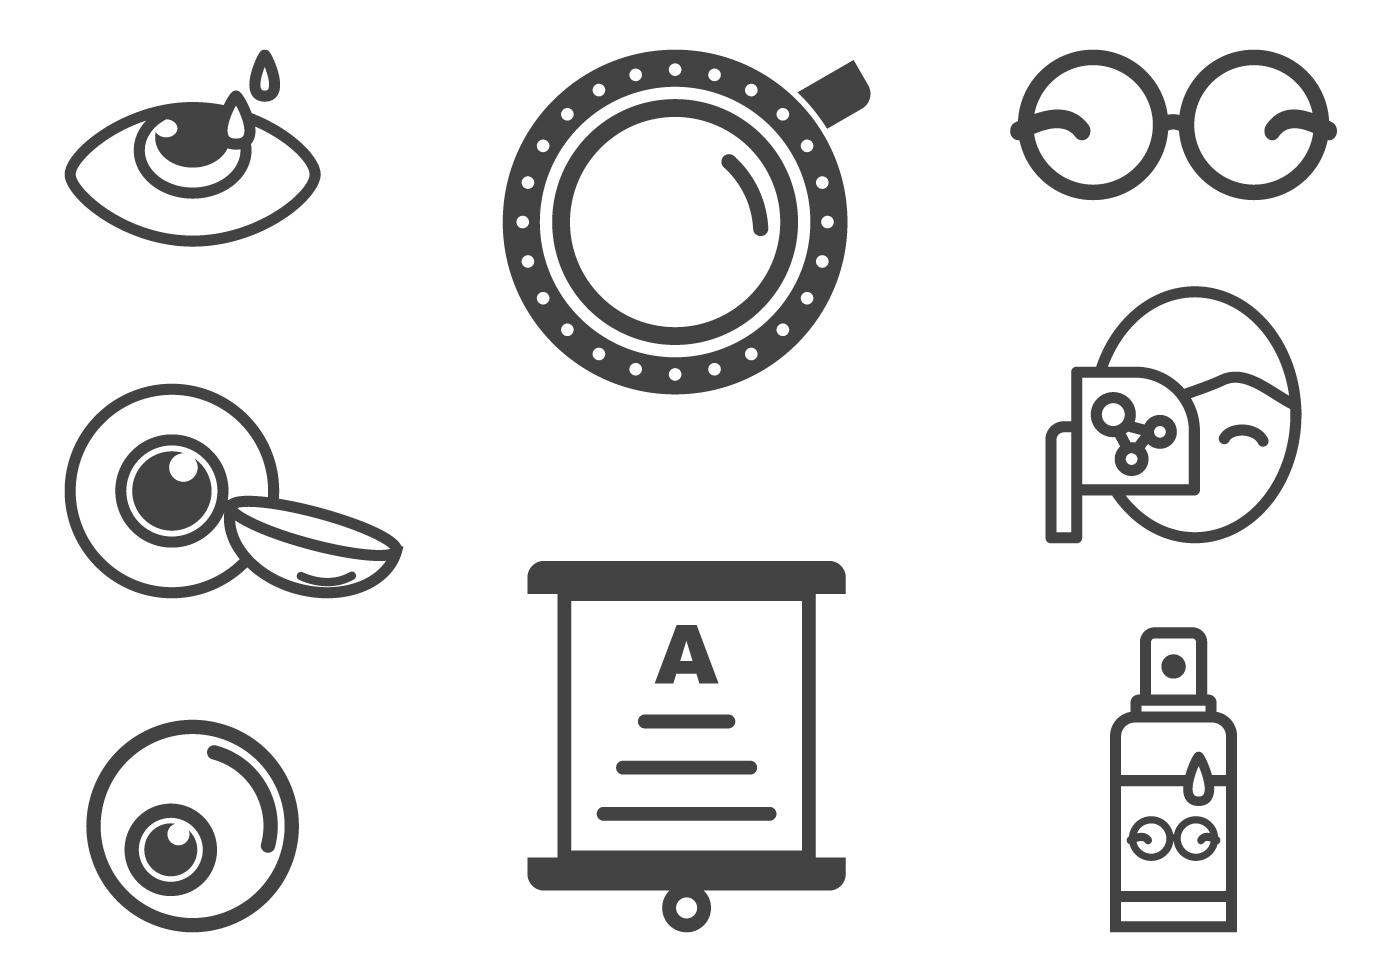 Optometry And Eye Health Icons